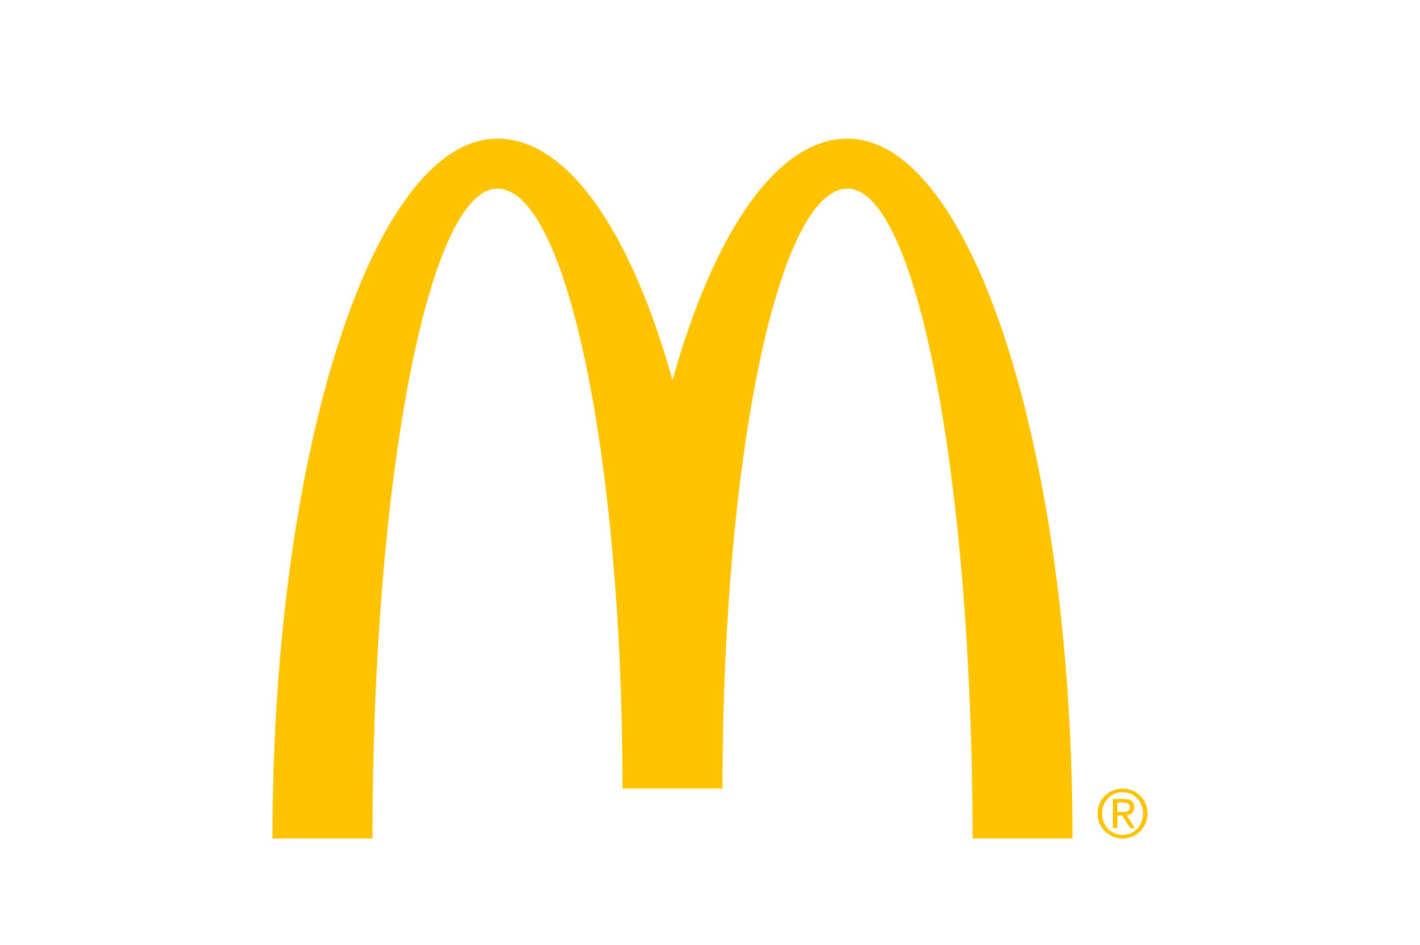 Logo of McDonald's